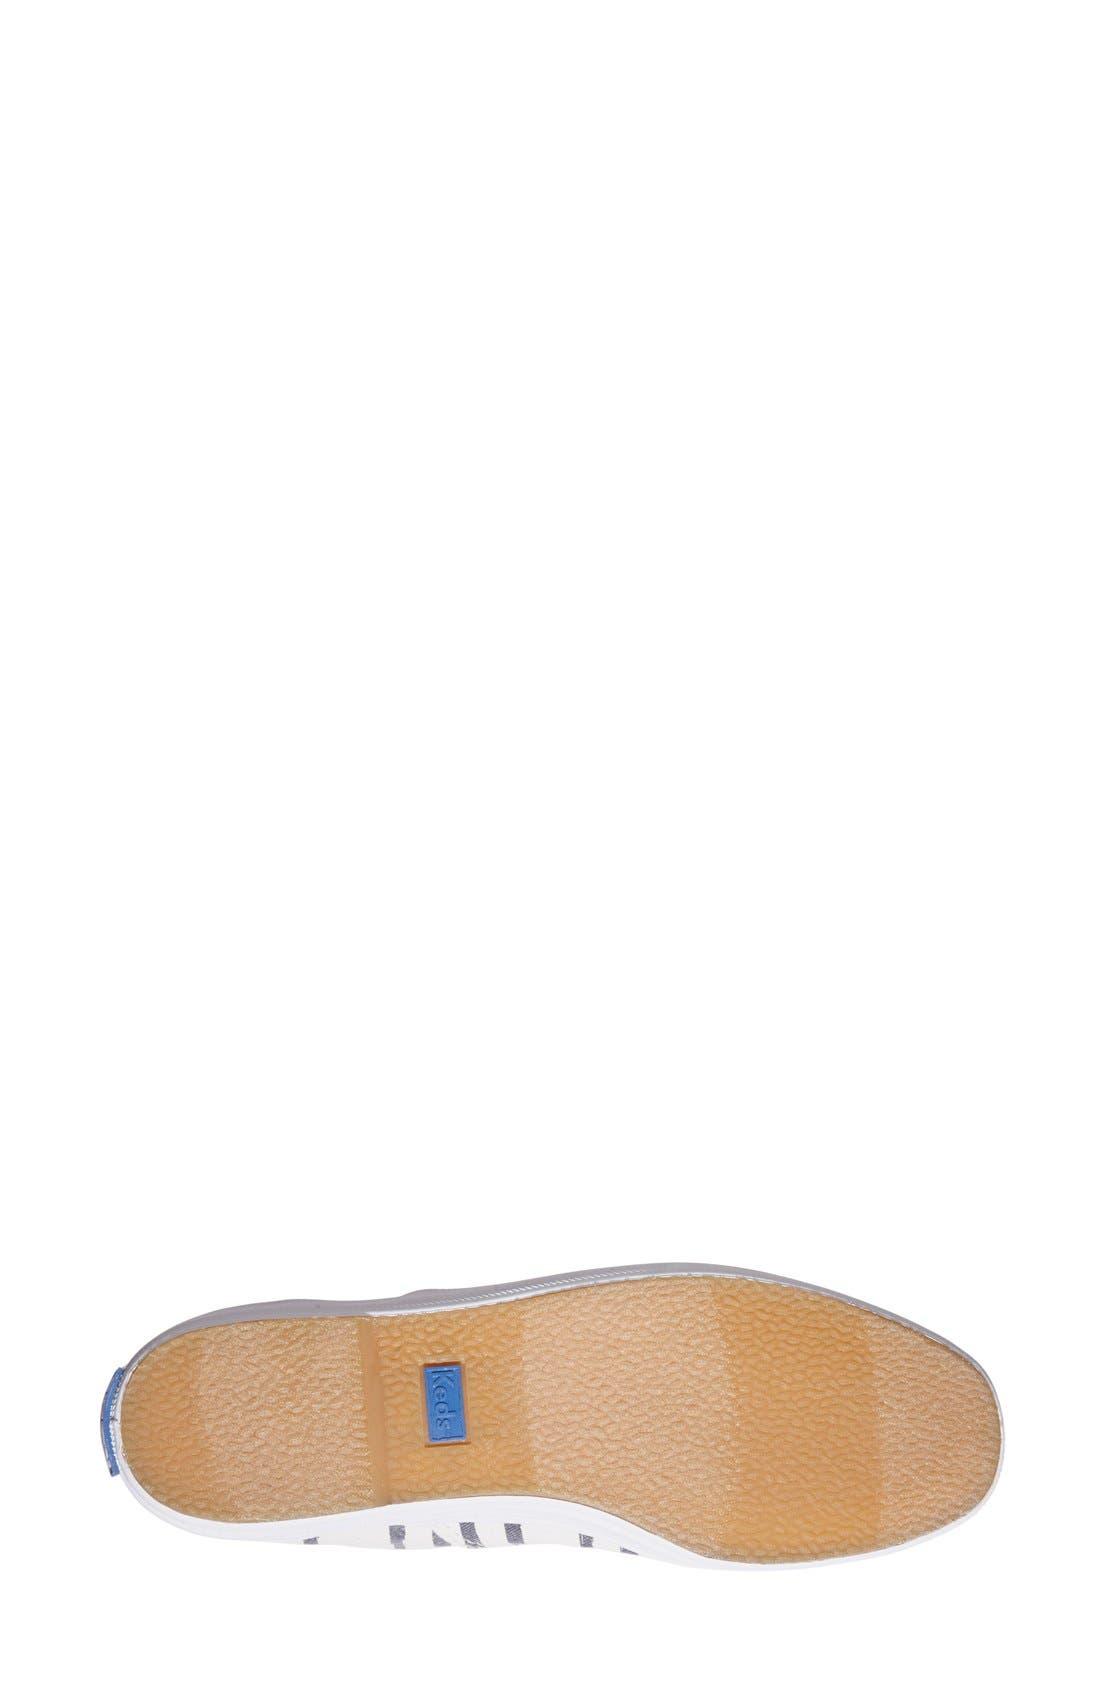 Alternate Image 2  - Keds® 'Champion - Washed Beach Stripe' Sneaker (Women)